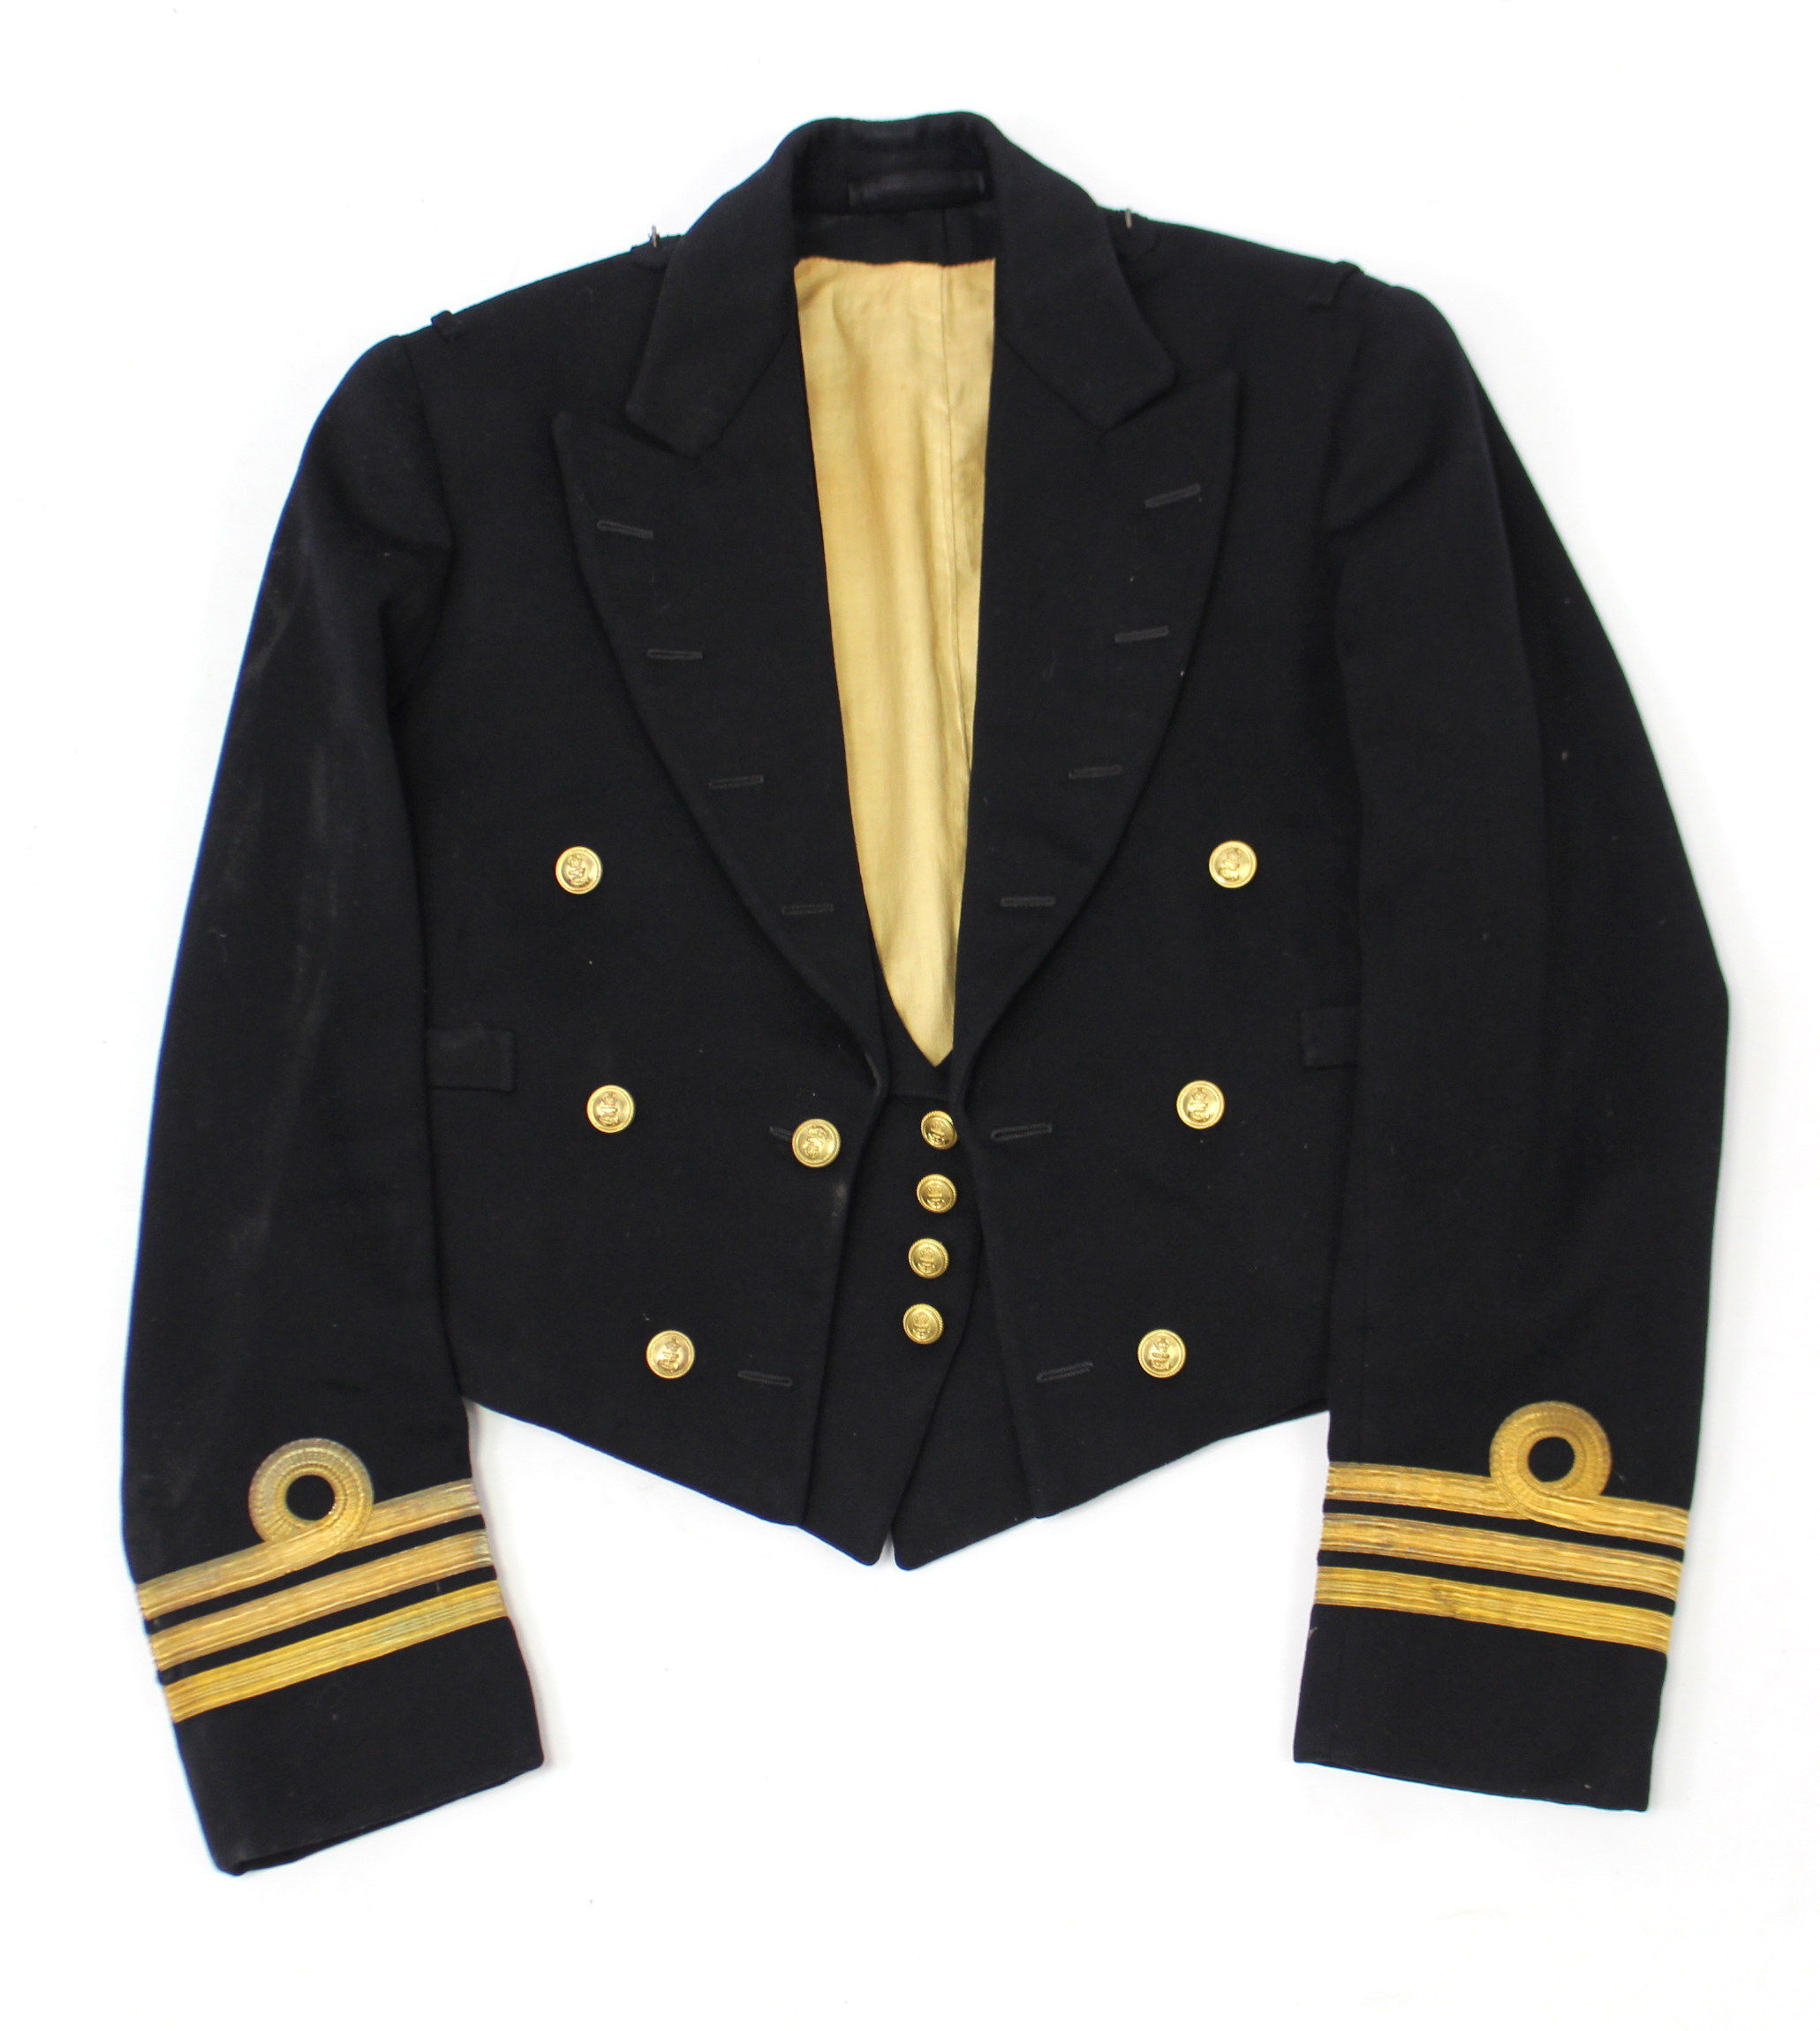 Lot 114 - A British naval commander's dress jacket & waistcoat.